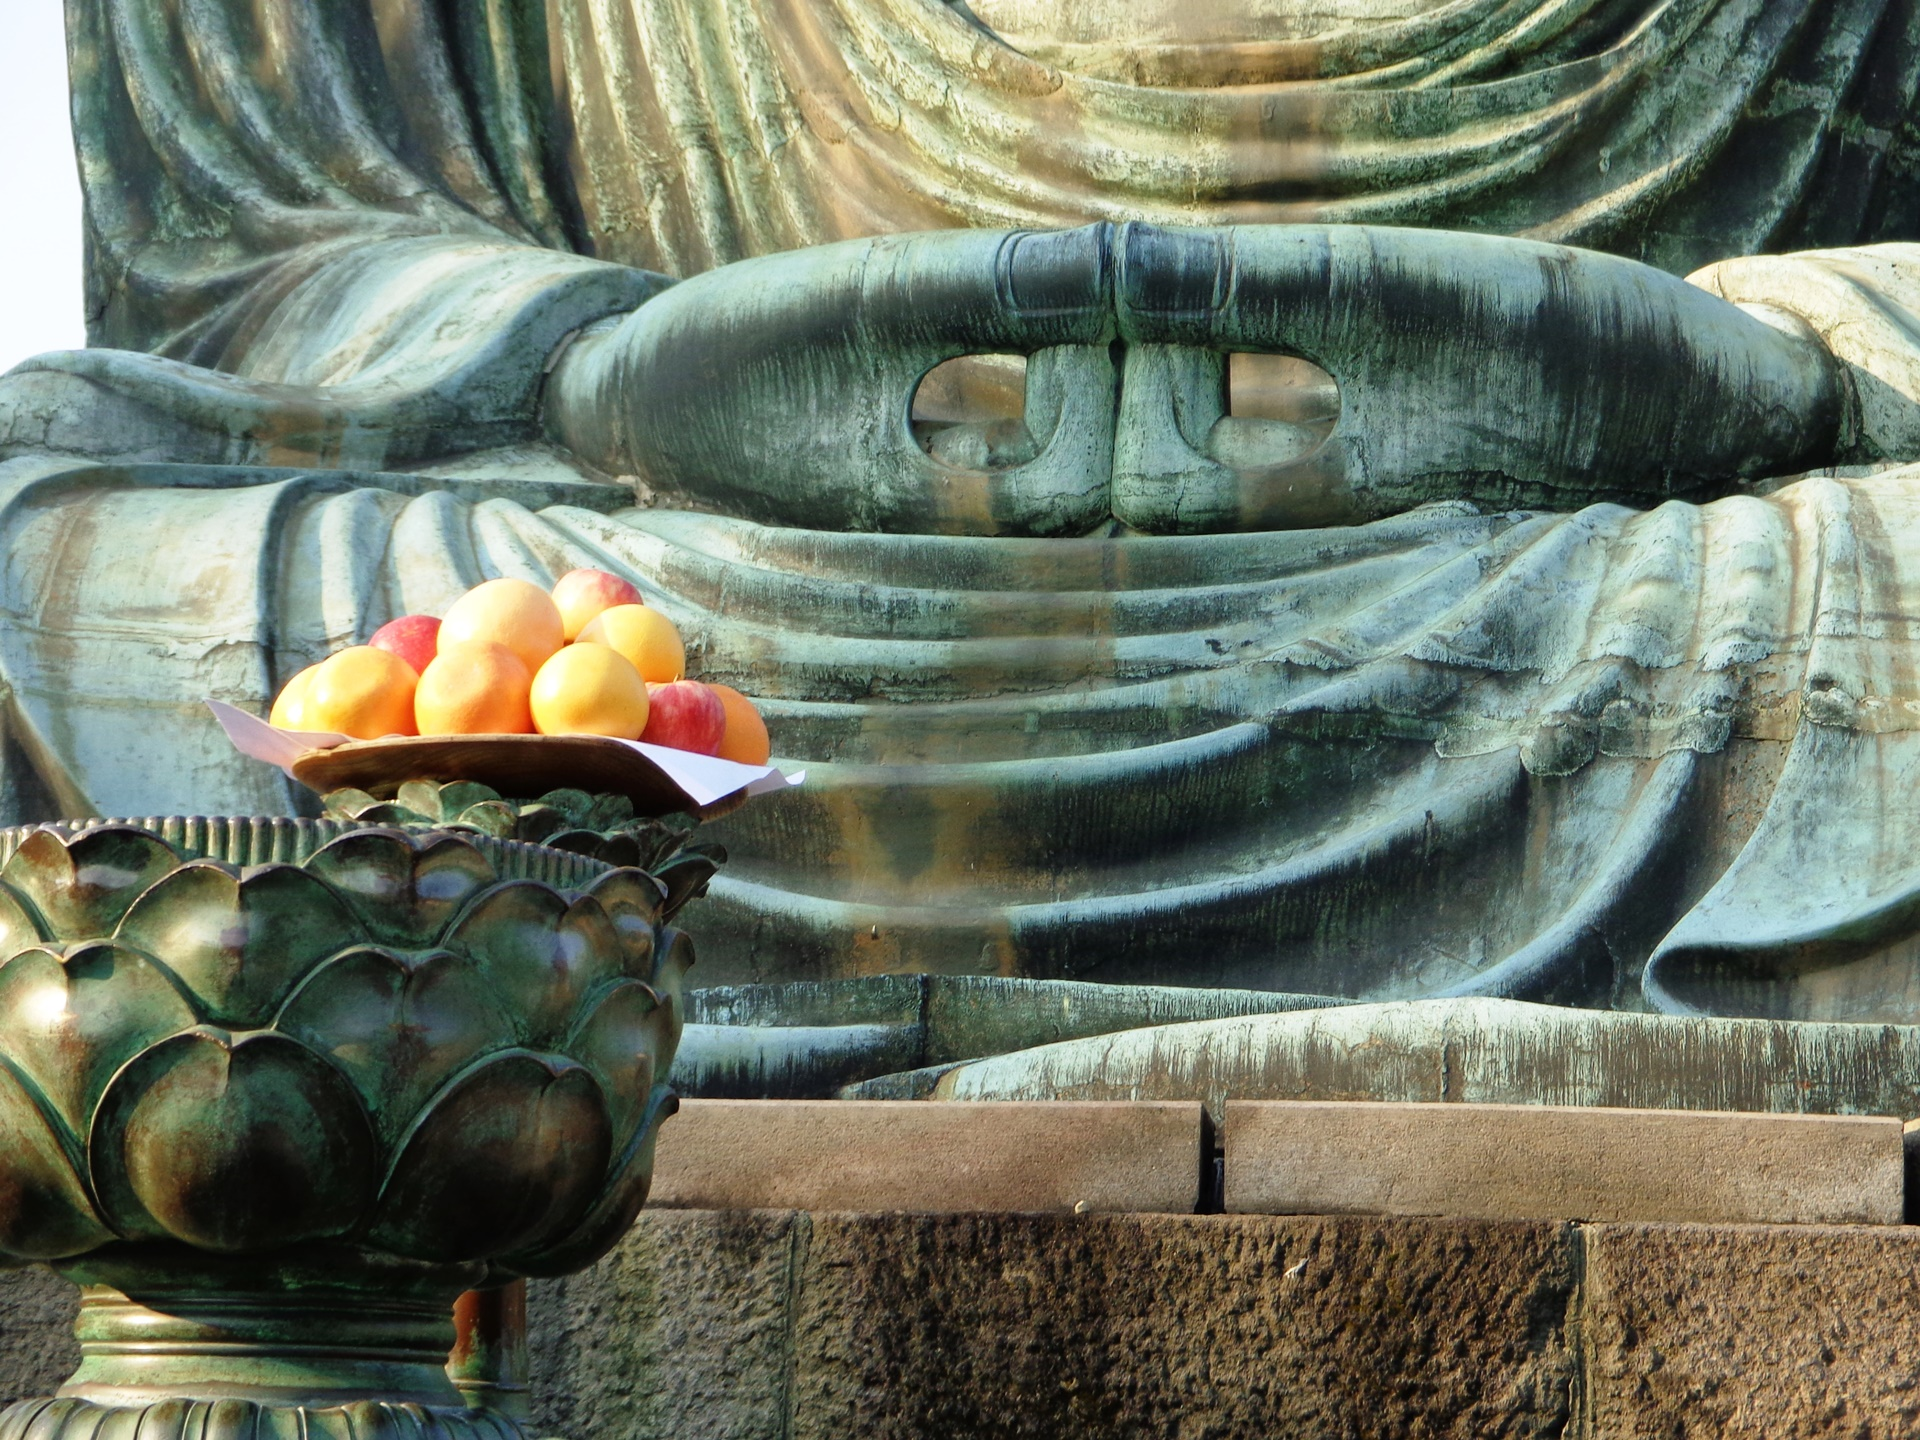 Lap of the Great Buddha, Kamakura, Japan